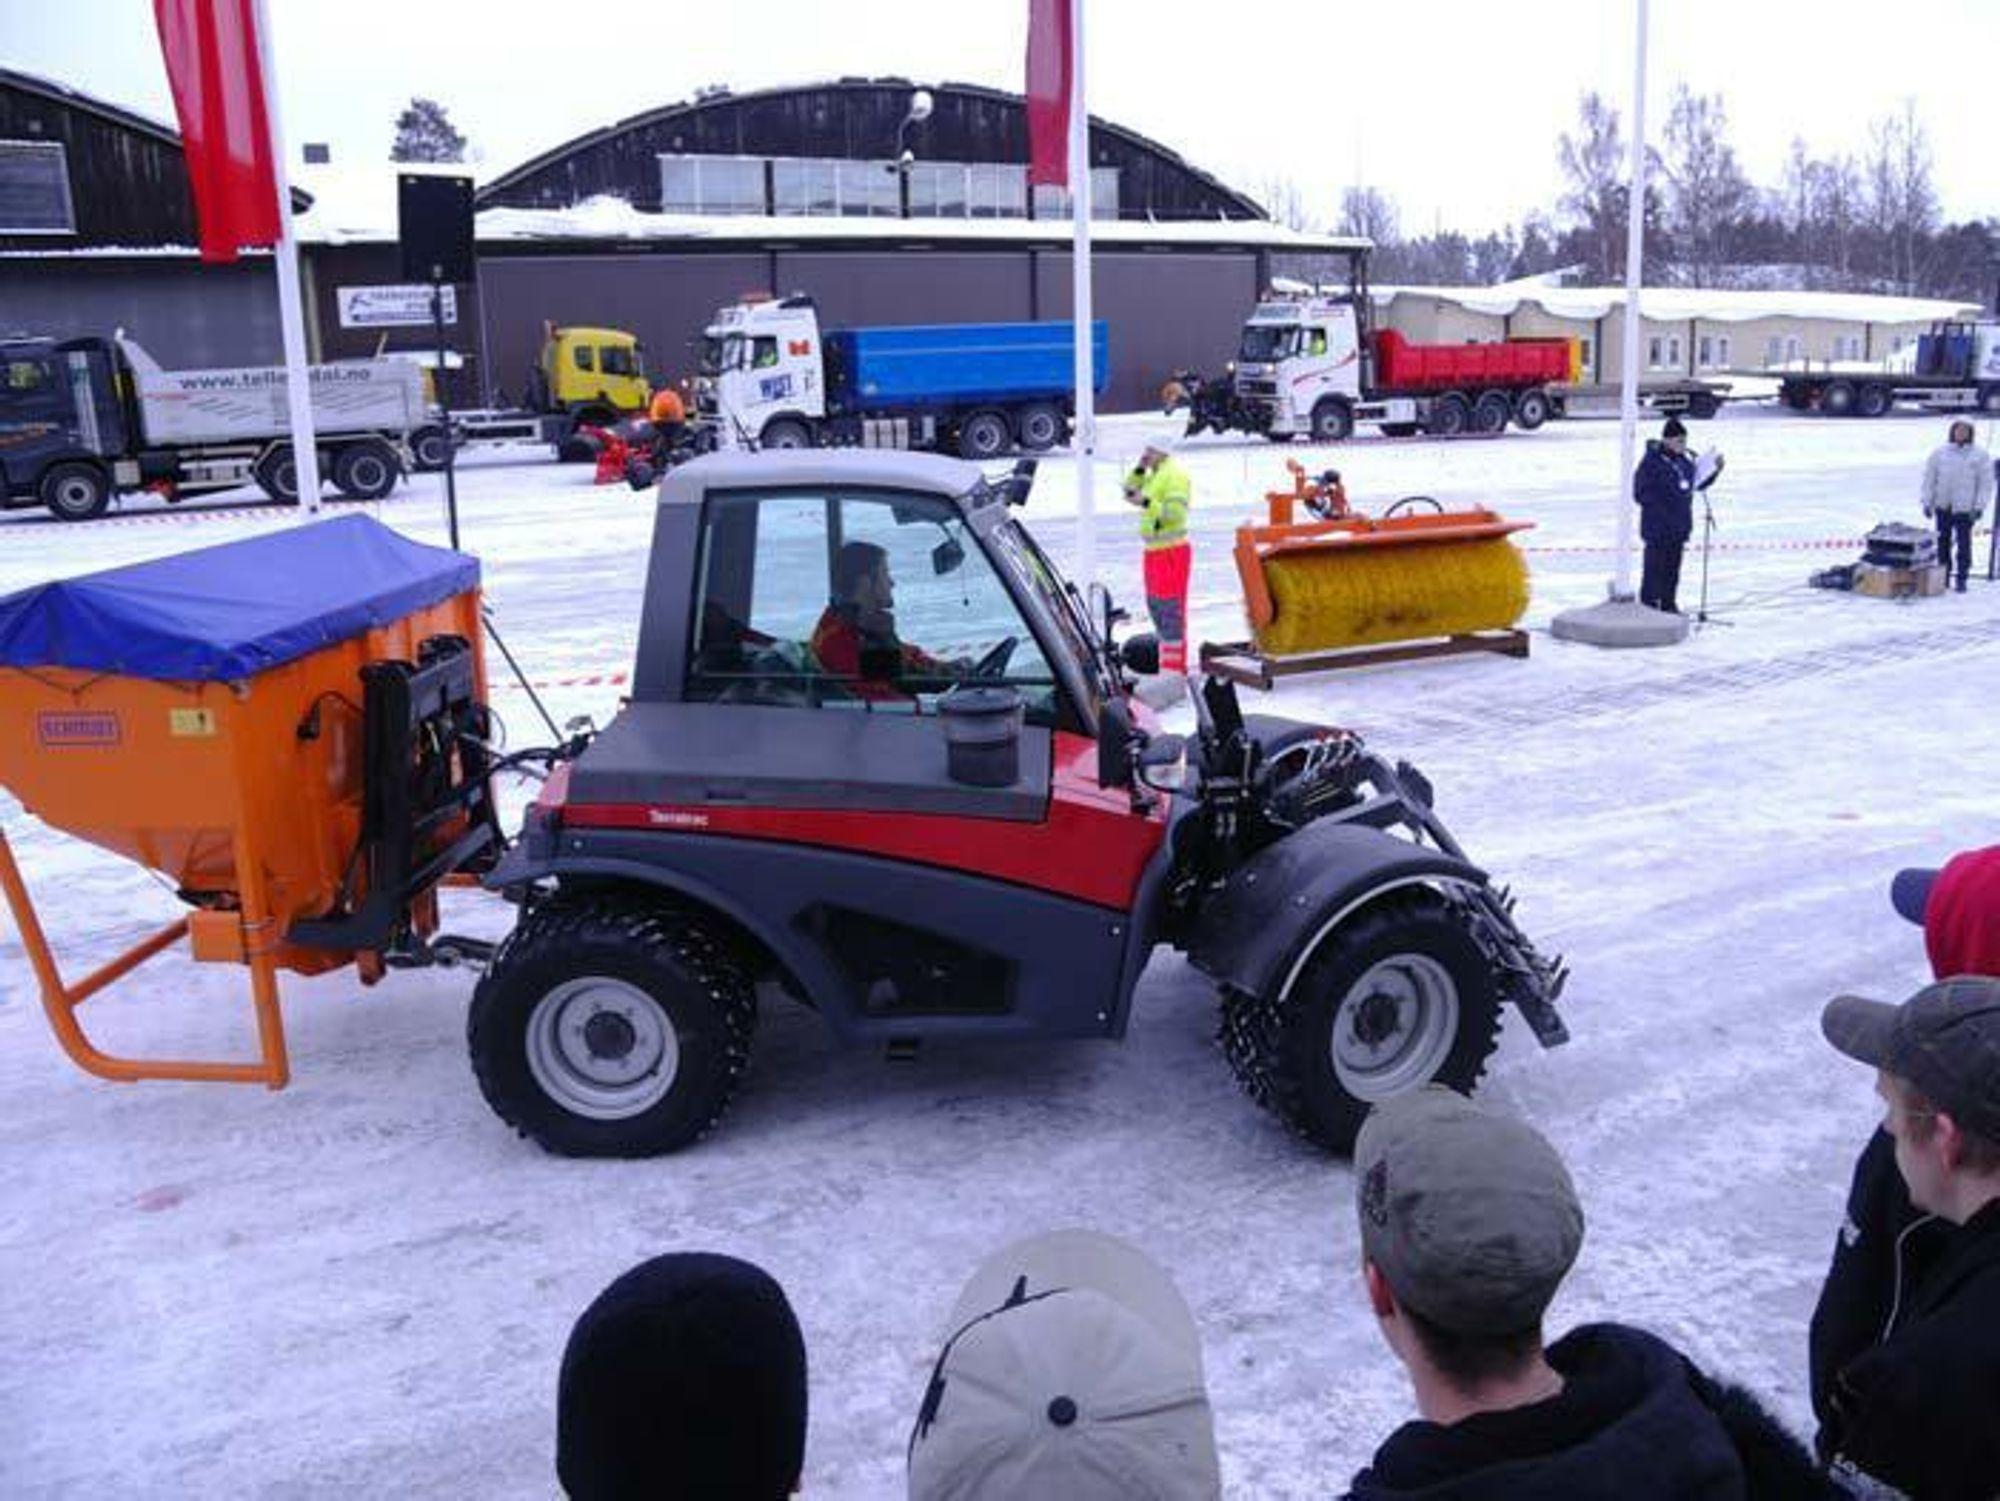 Klar for vinterdager i Østersund